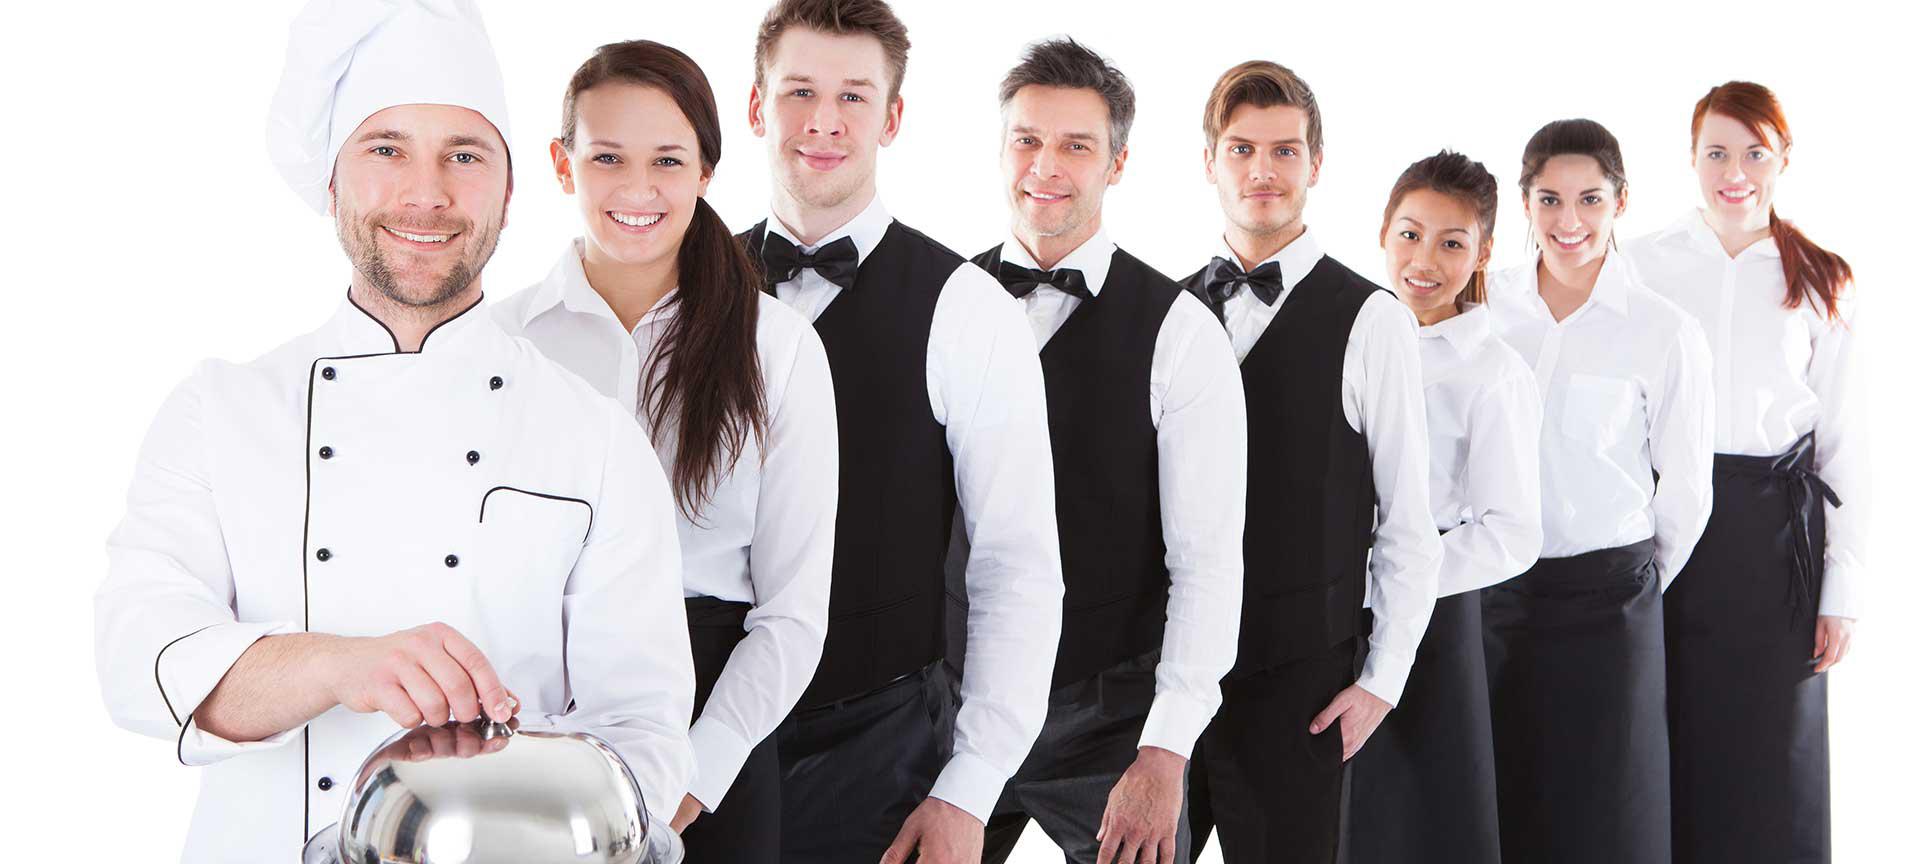 Картинки работников ресторана